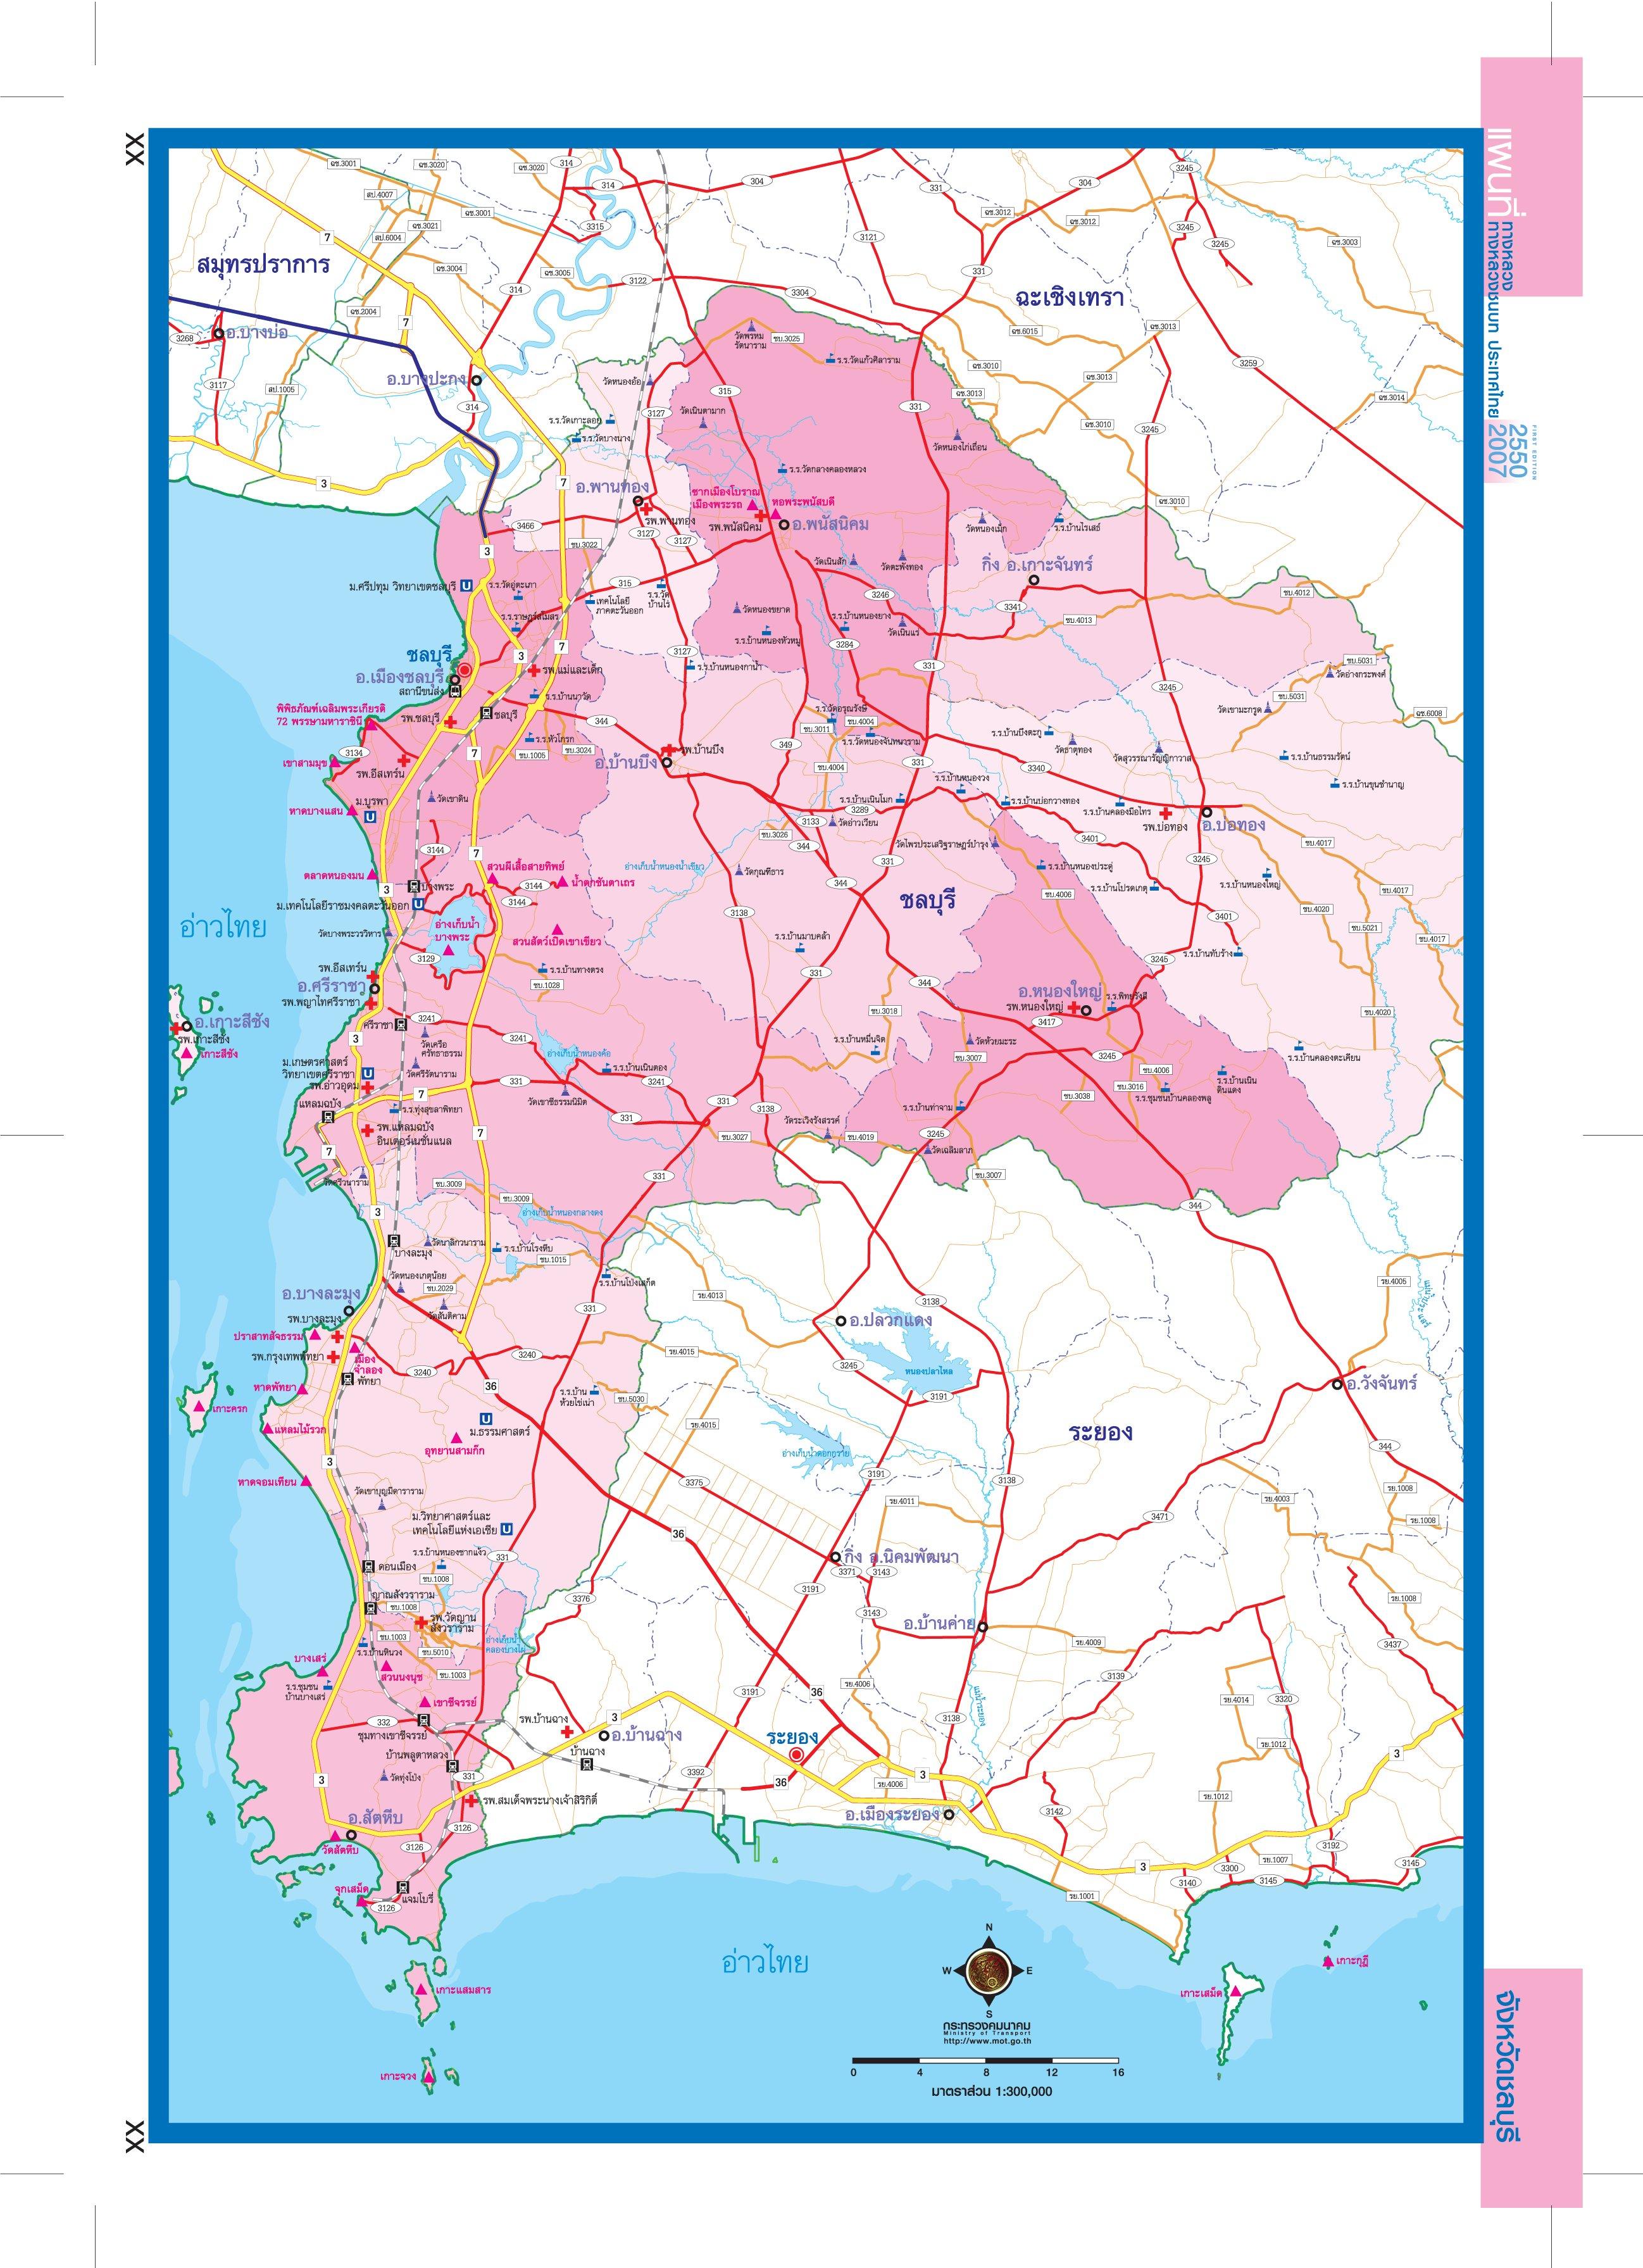 Chonburi Thailand Map chonburi thailand mappery